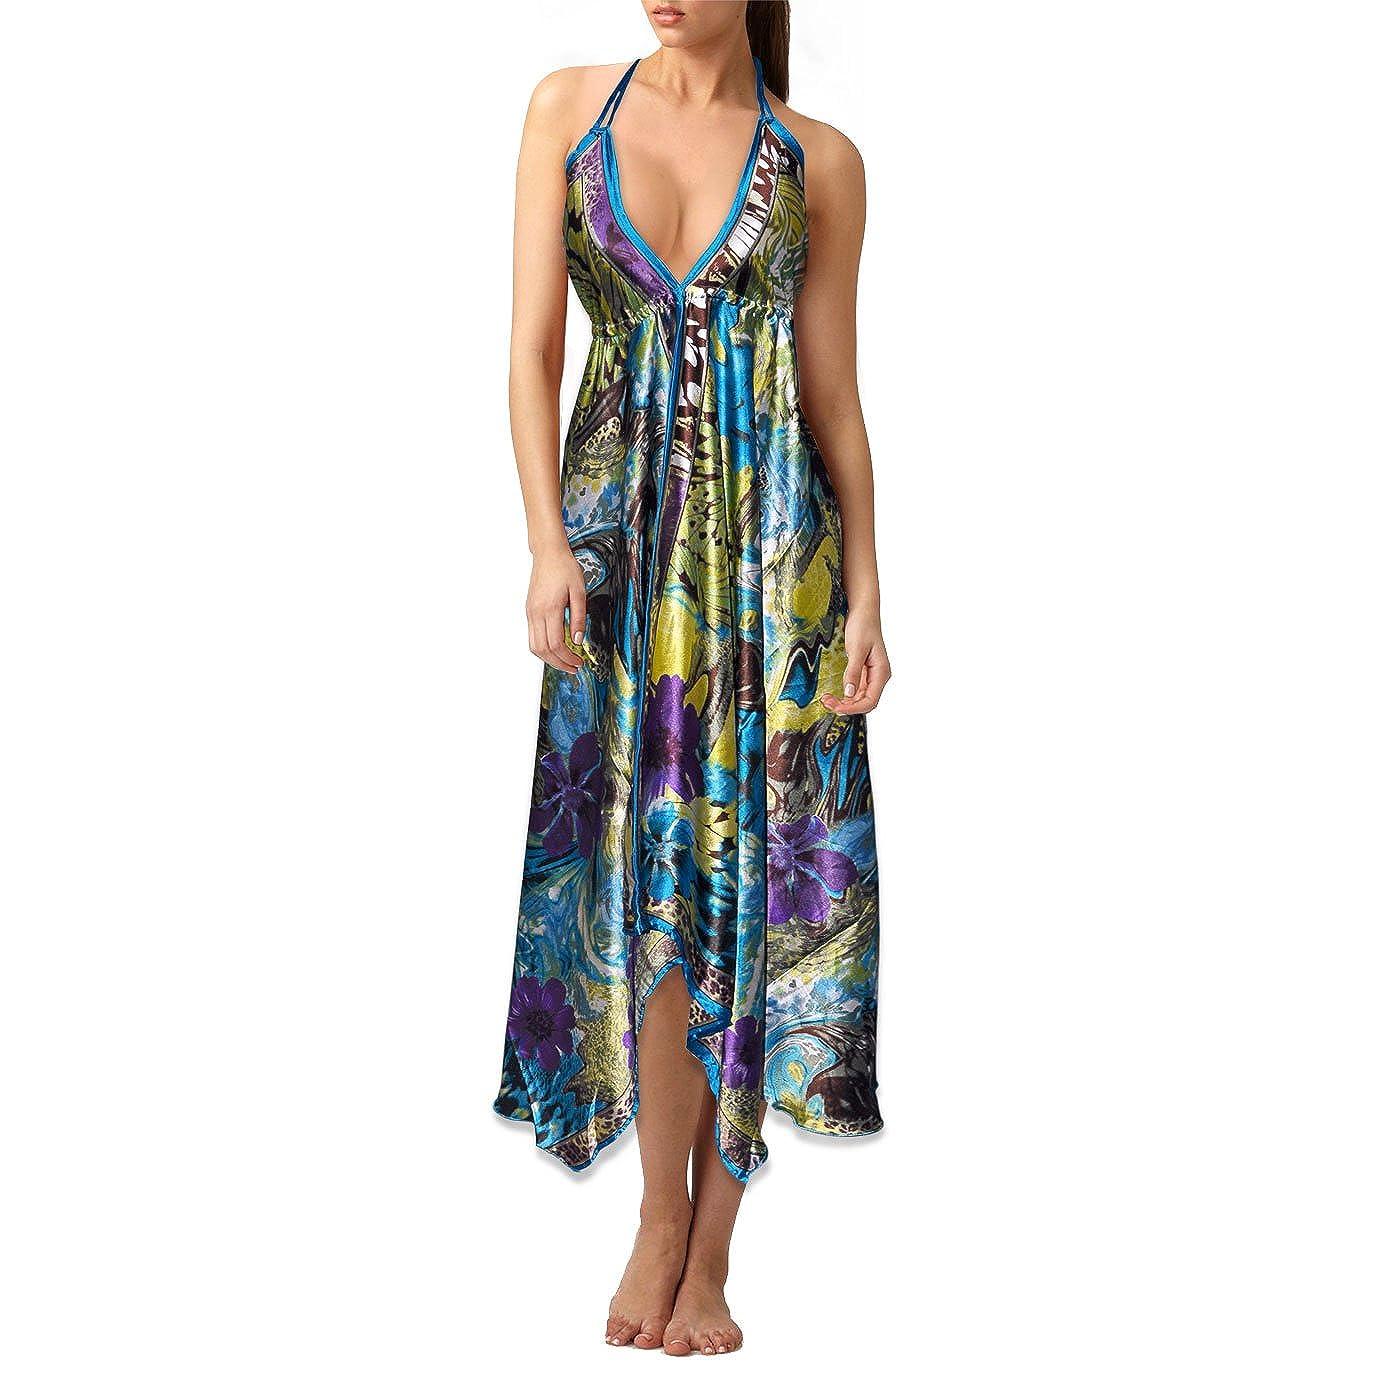 aa302aef1be Amazon.com  Beach Dresses for Girls Handkerchief Hem Clothing  Clothing